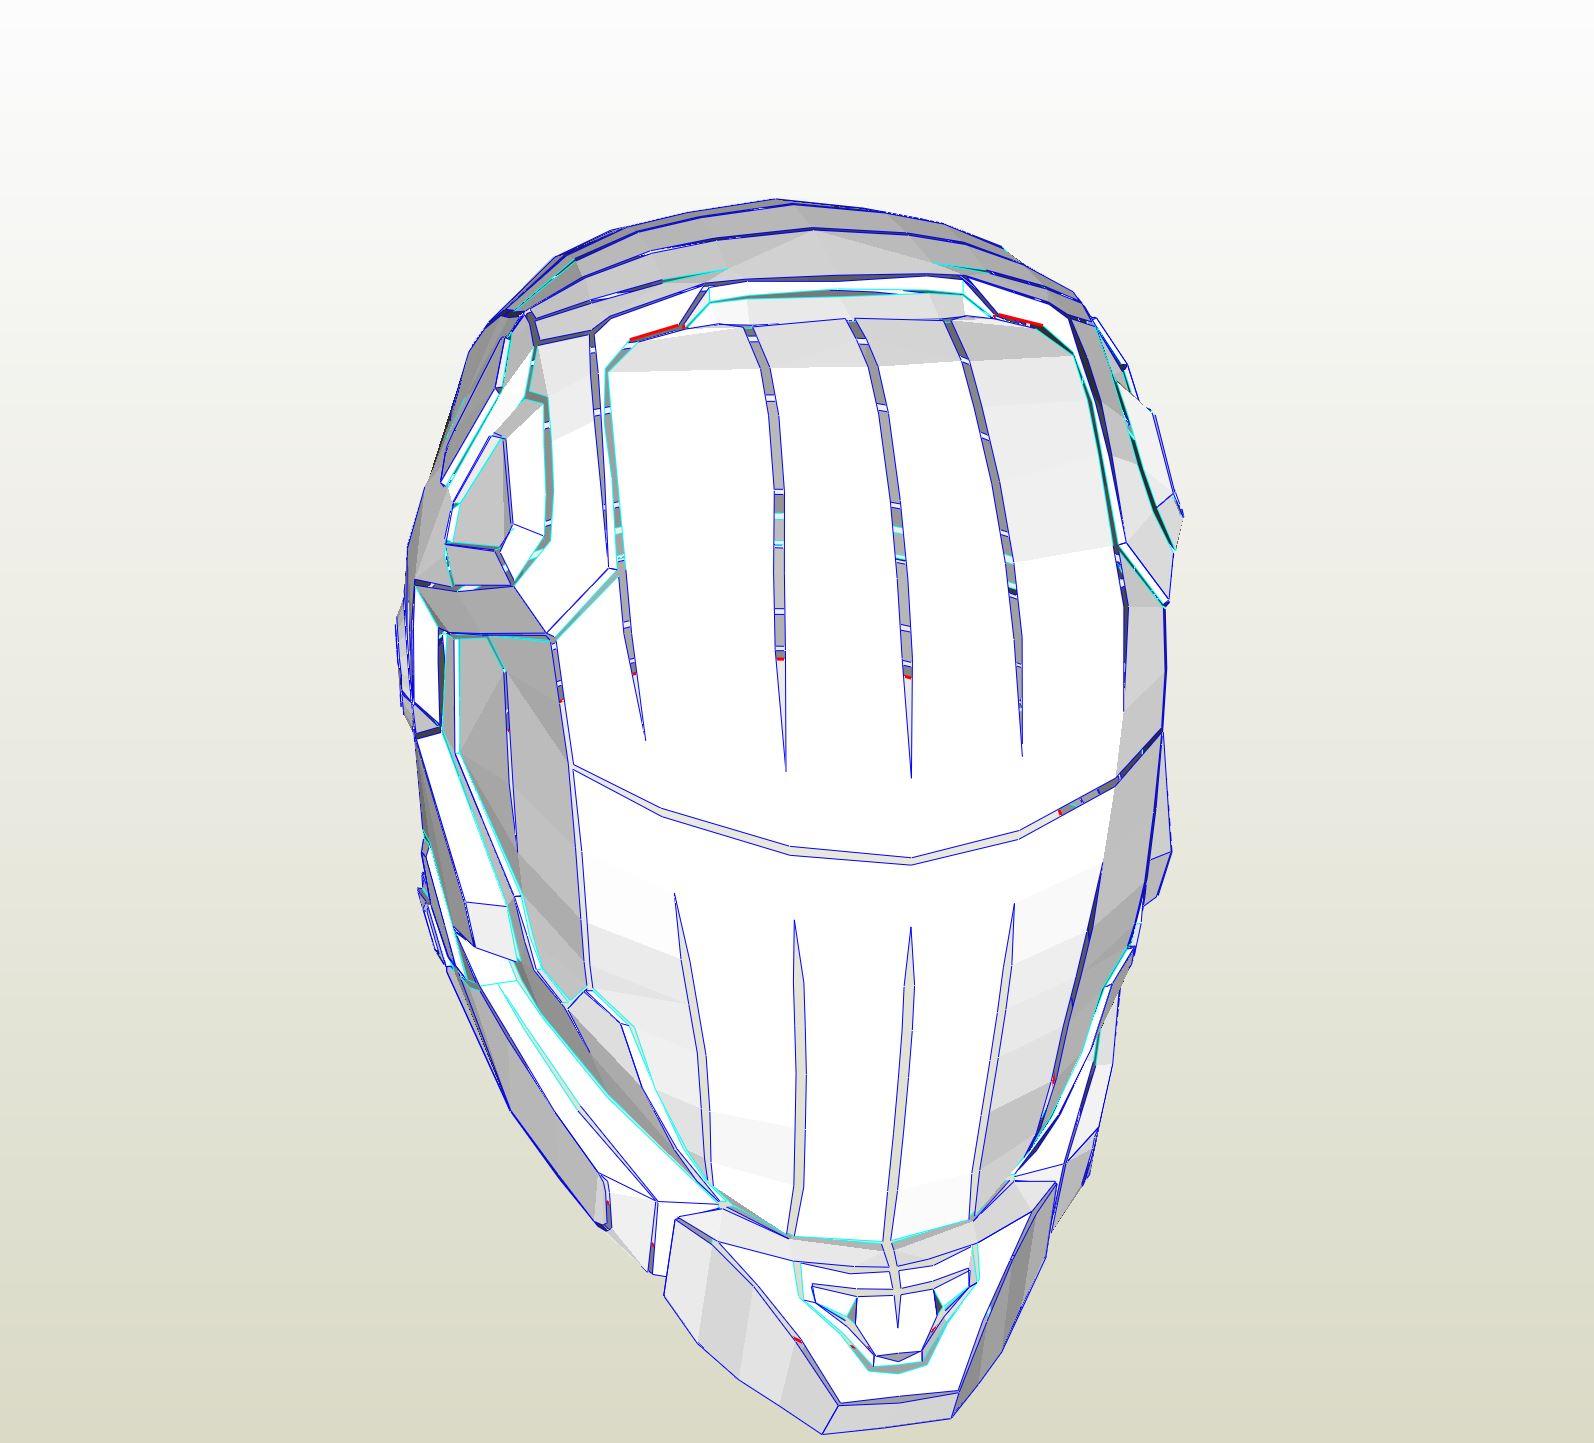 Halo: Reach - MJOLNIR Mark V - Pilot | Halo Costume and Prop Maker